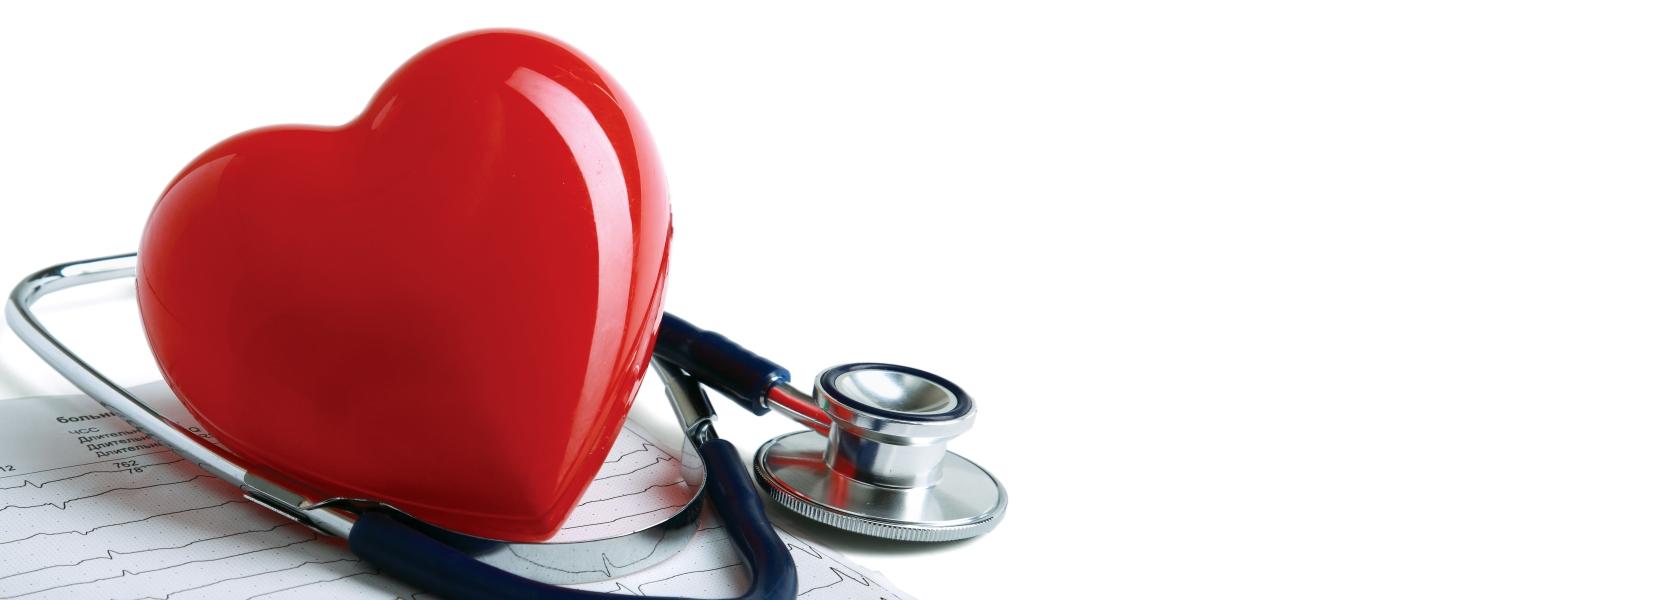 Медцентрум Комплексное обследование у кардиолога